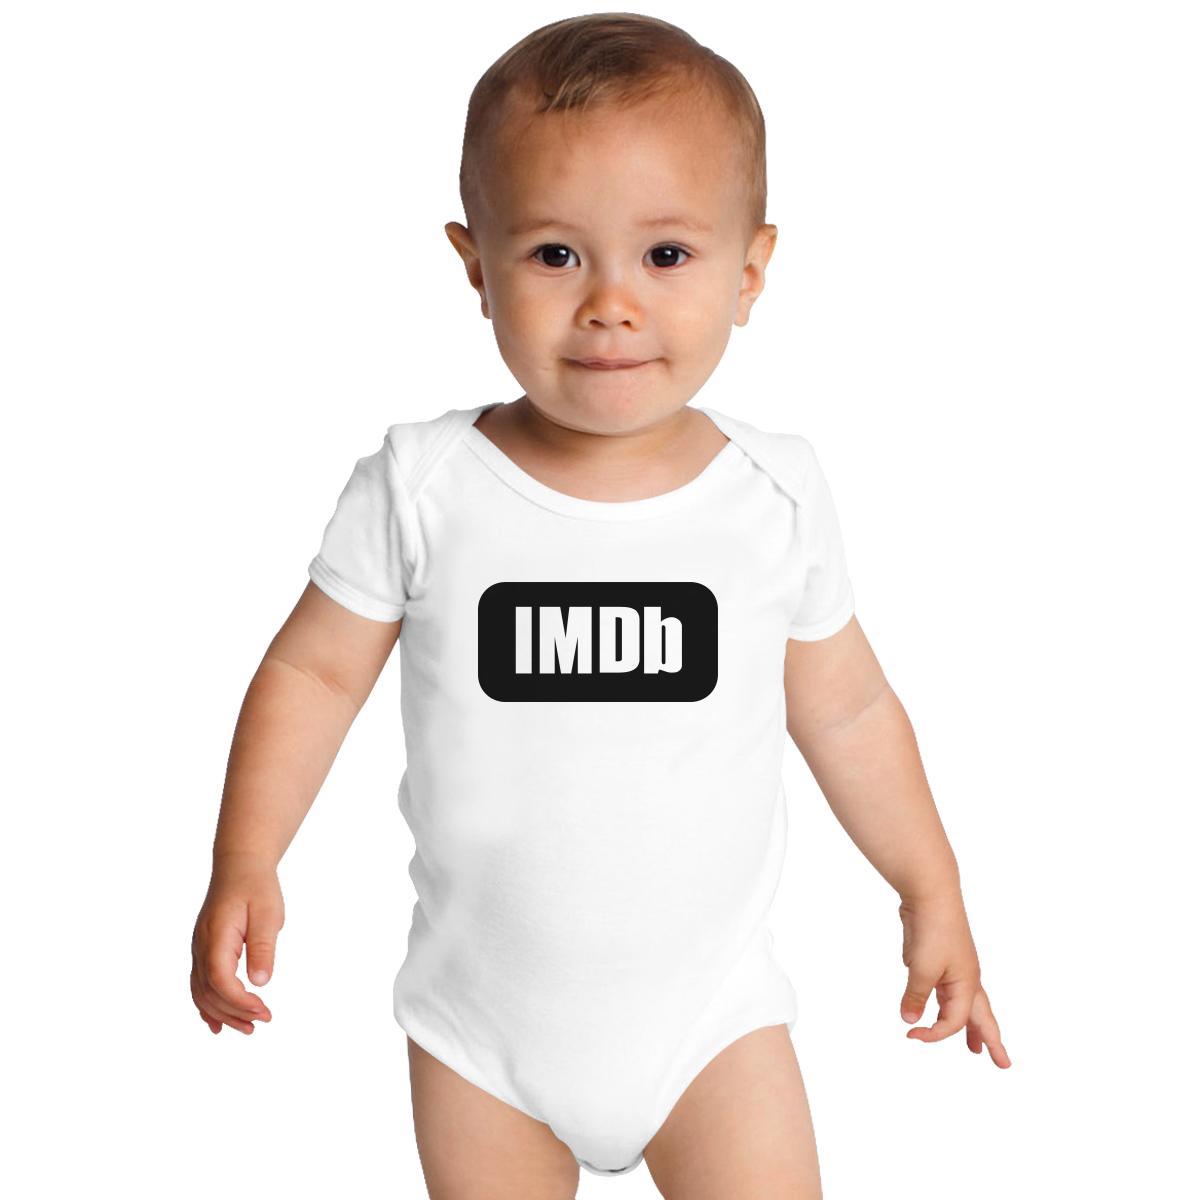 IMDb Logo Baby Onesies | Customon.com